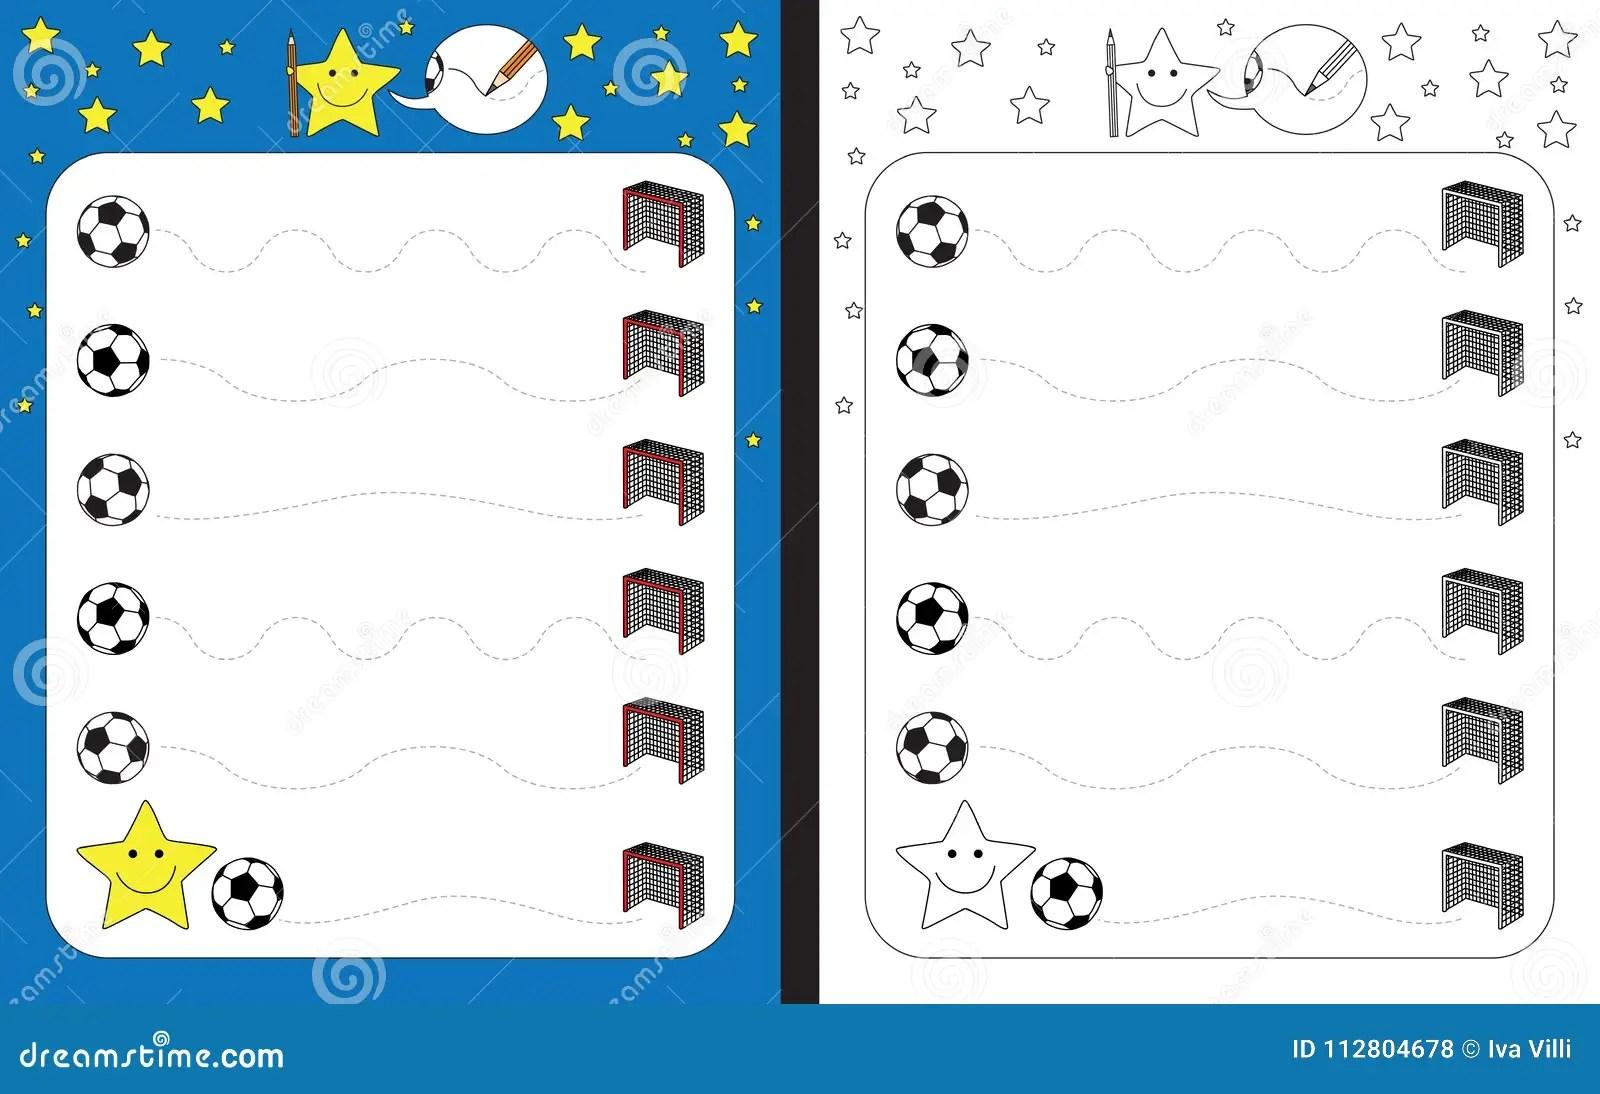 Preschool Worksheet Stock Vector Illustration Of Soccer